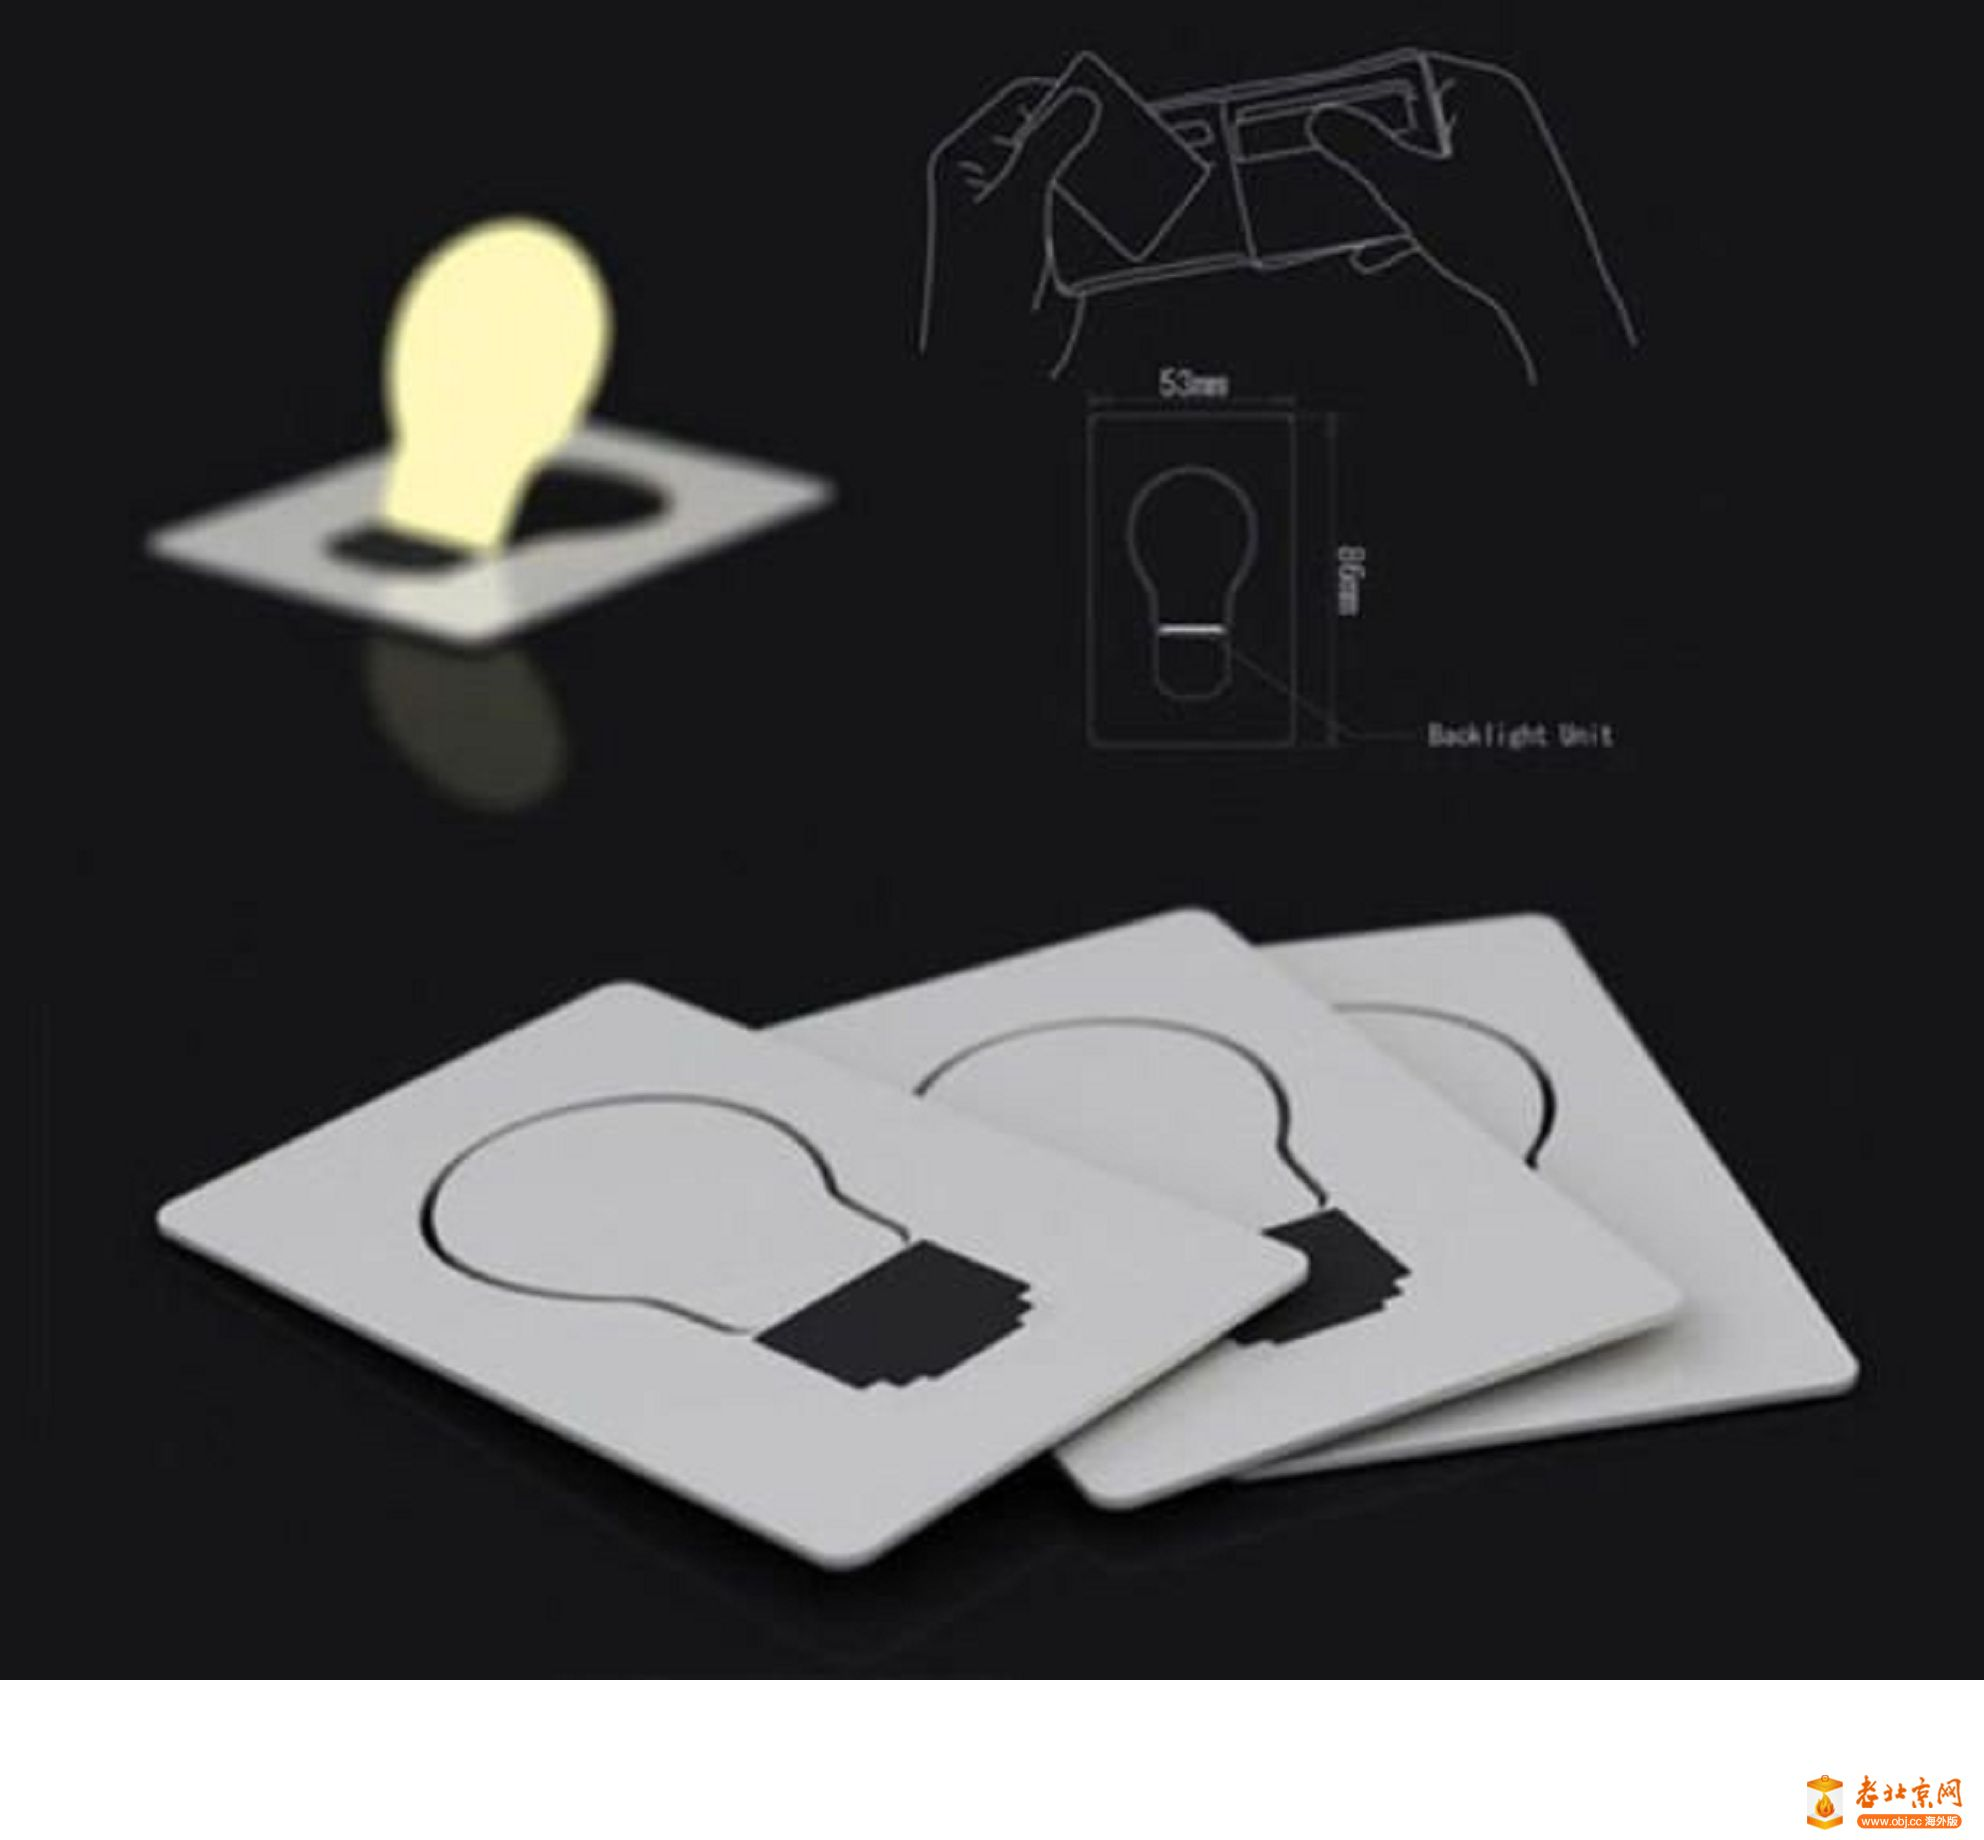 This light bulb  fits in your wallet 这个灯泡可装进你的皮夹...